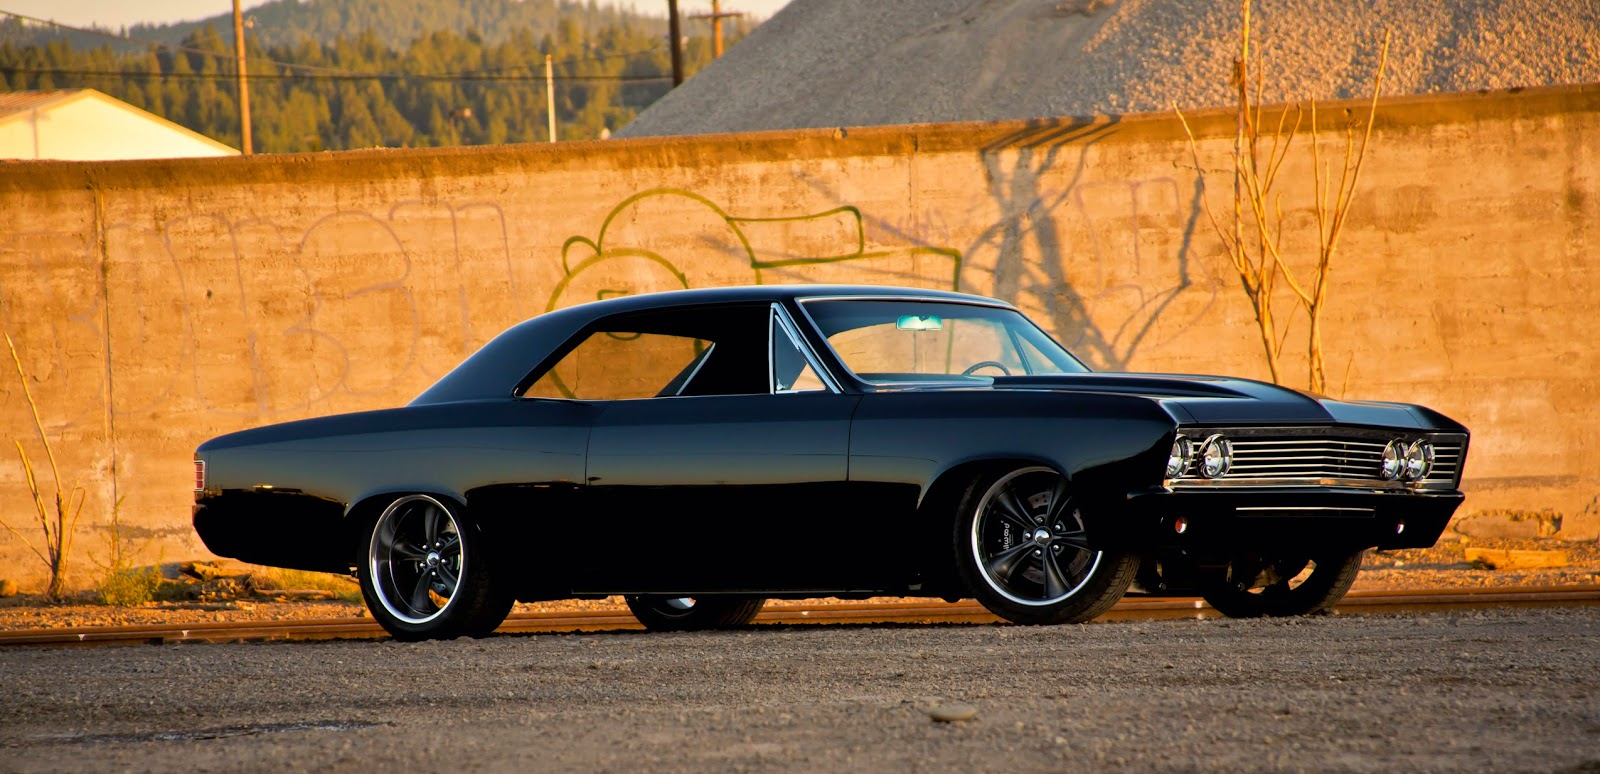 Canton Akron Classic Car Rims